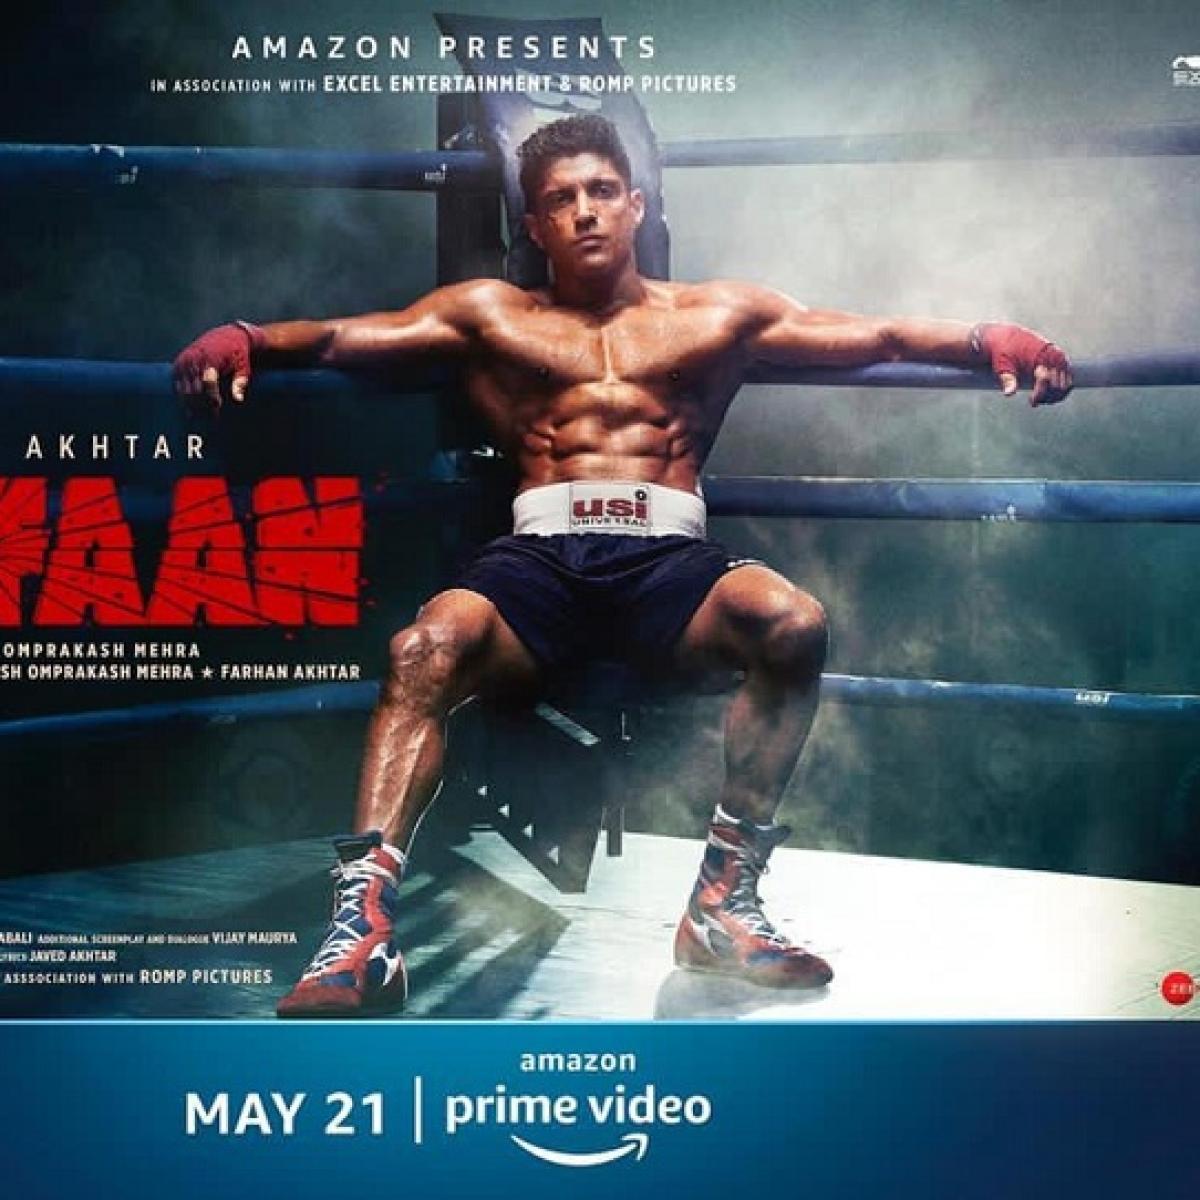 Shooting for Farhan Akhtar-starrer 'Toofaan' was a challenge for director Rakeysh Omprakash Mehra